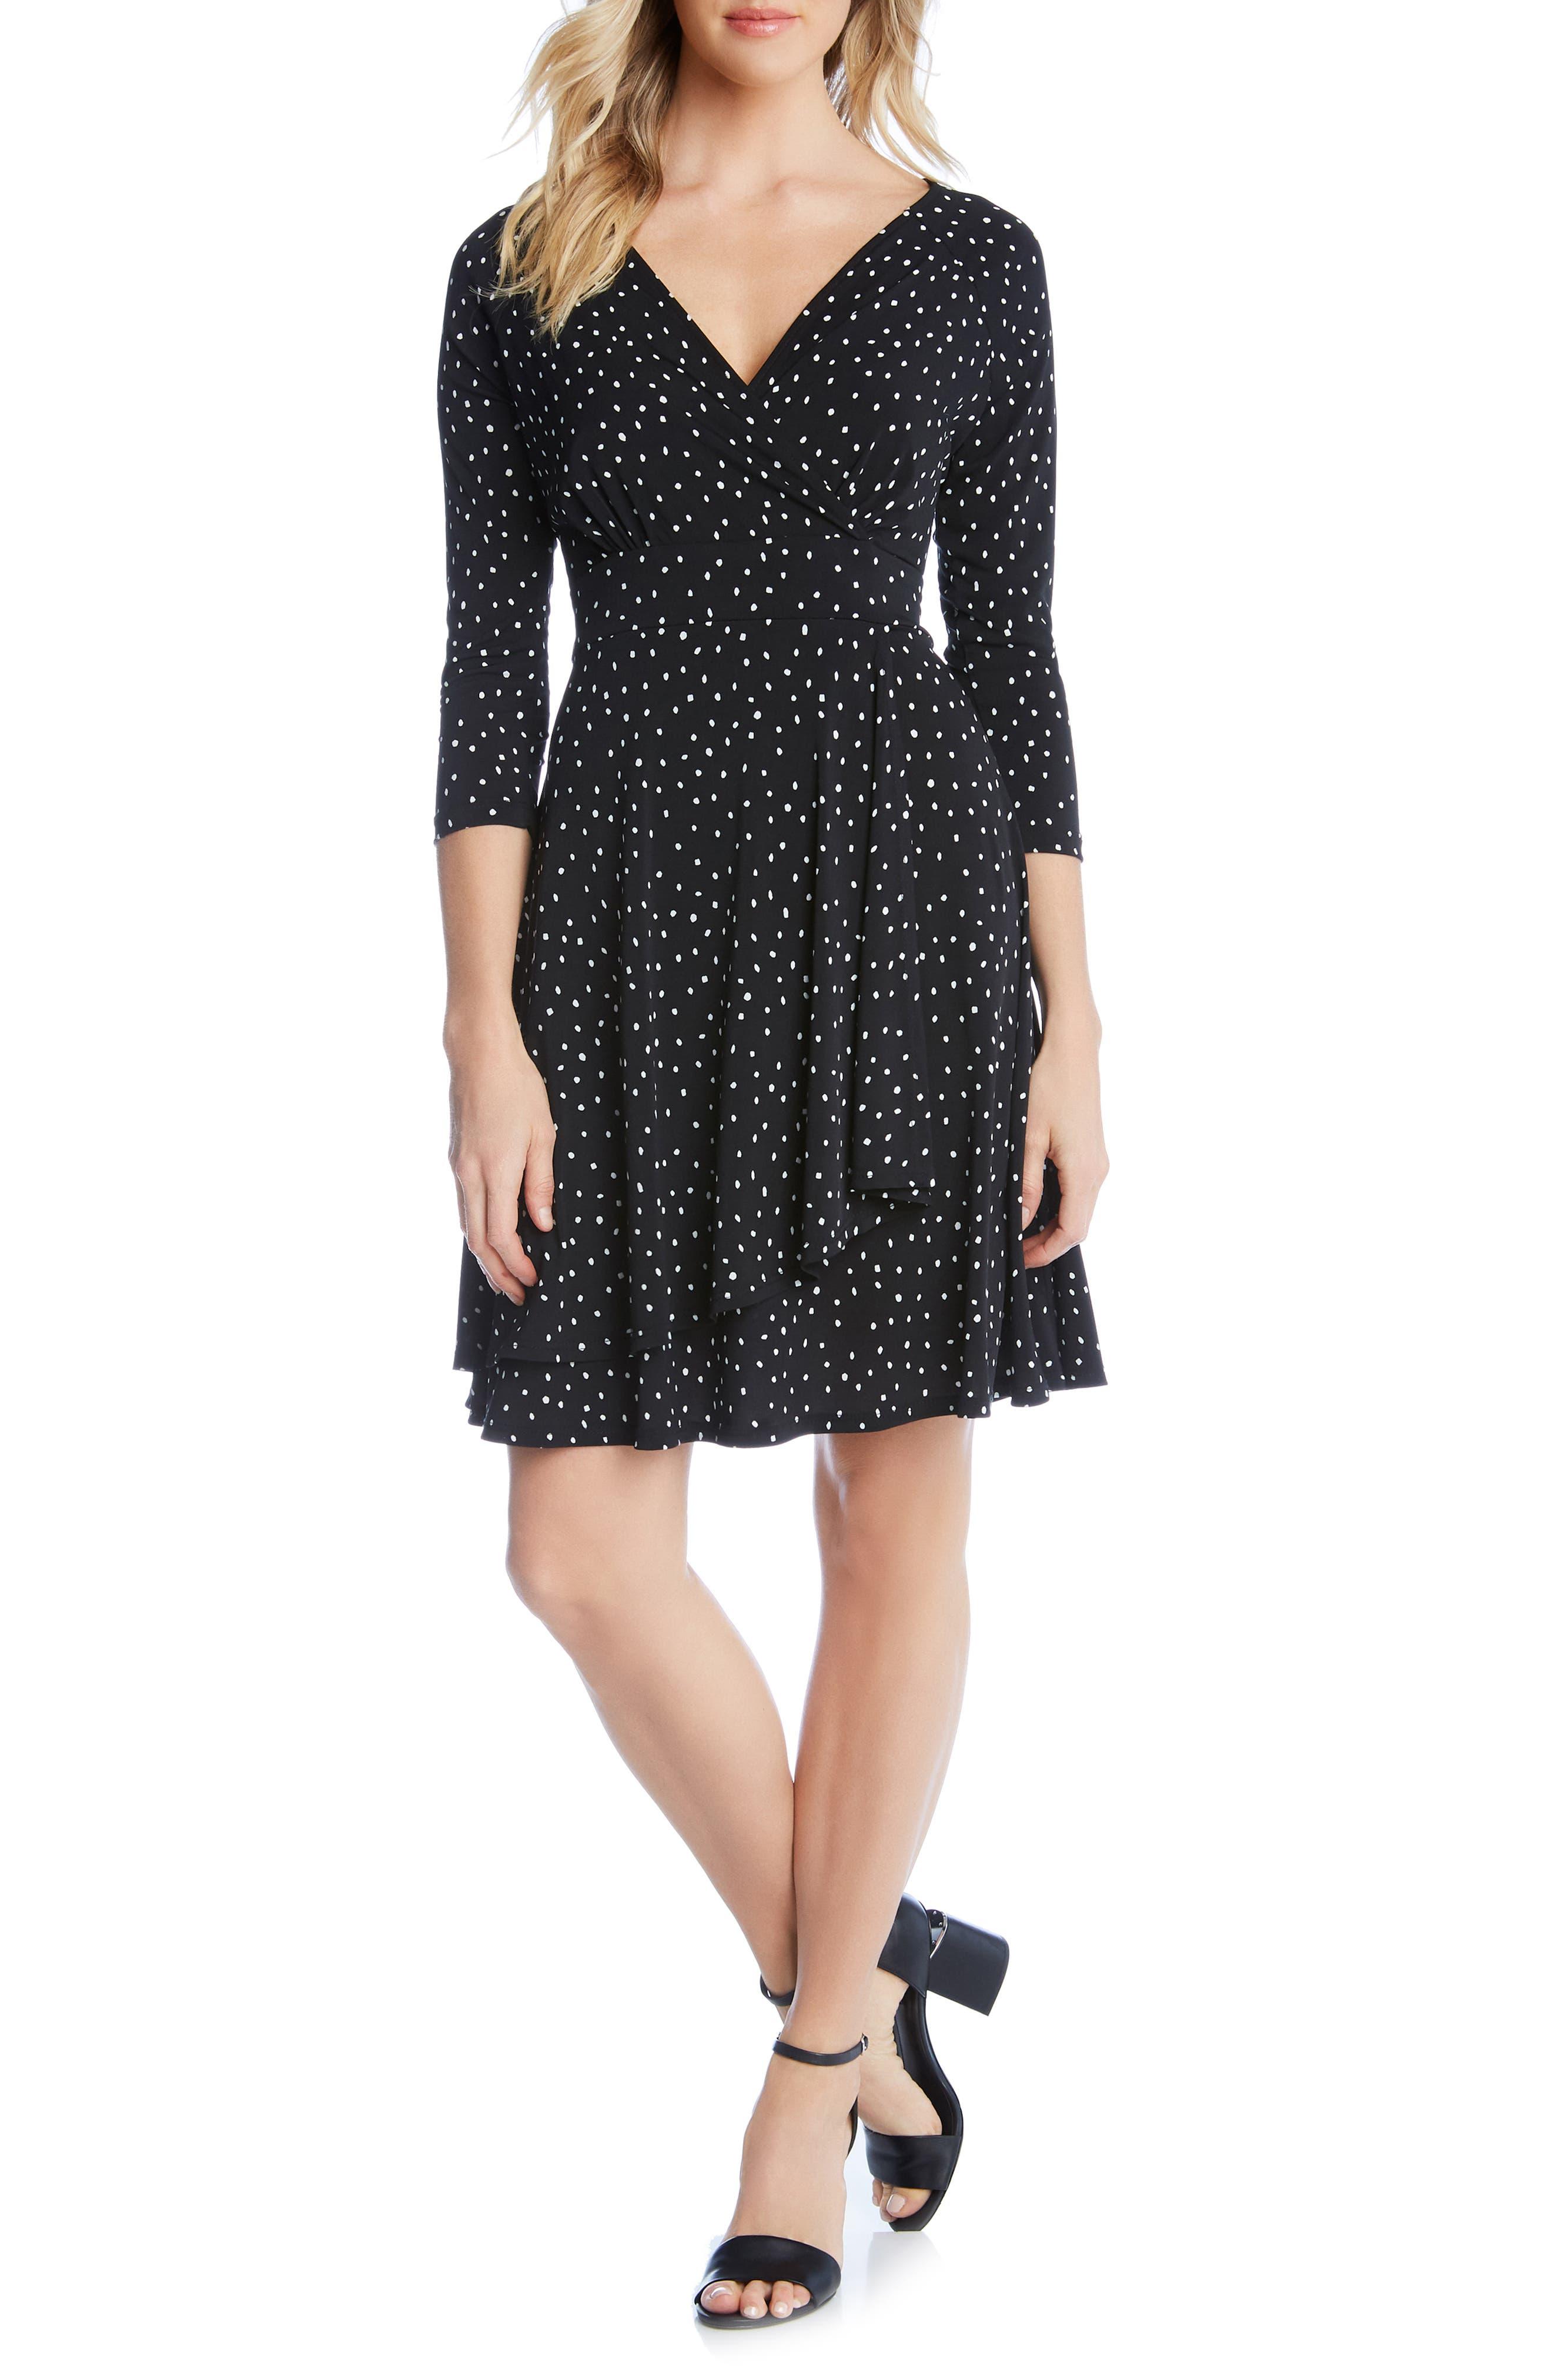 KAREN KANE Faux Wrap Dress, Main, color, 001